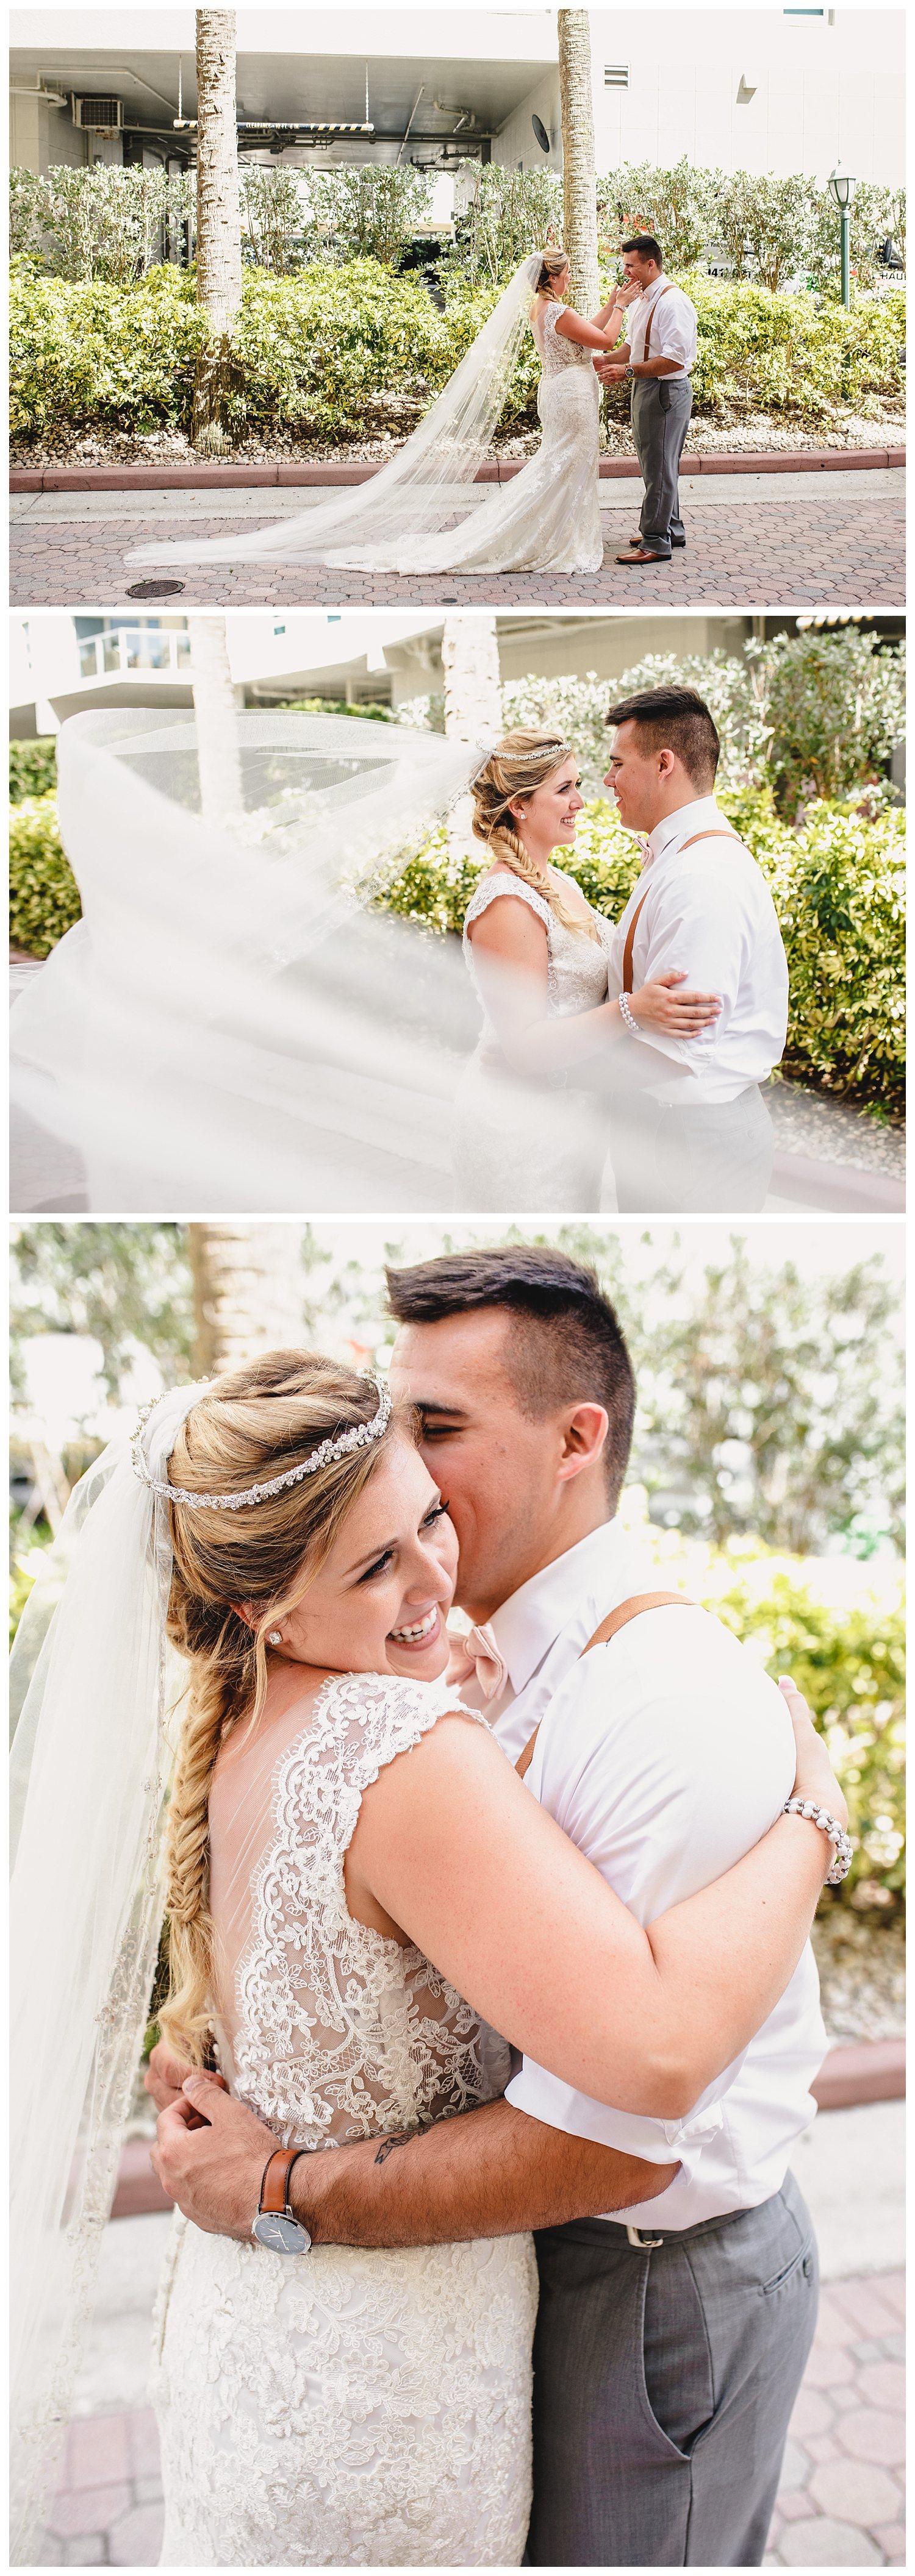 Kelsey_Diane_Photography_Destination_Wedding_Sarasota_Florida_Beach_Wedding_Alex_Austin_0635.jpg